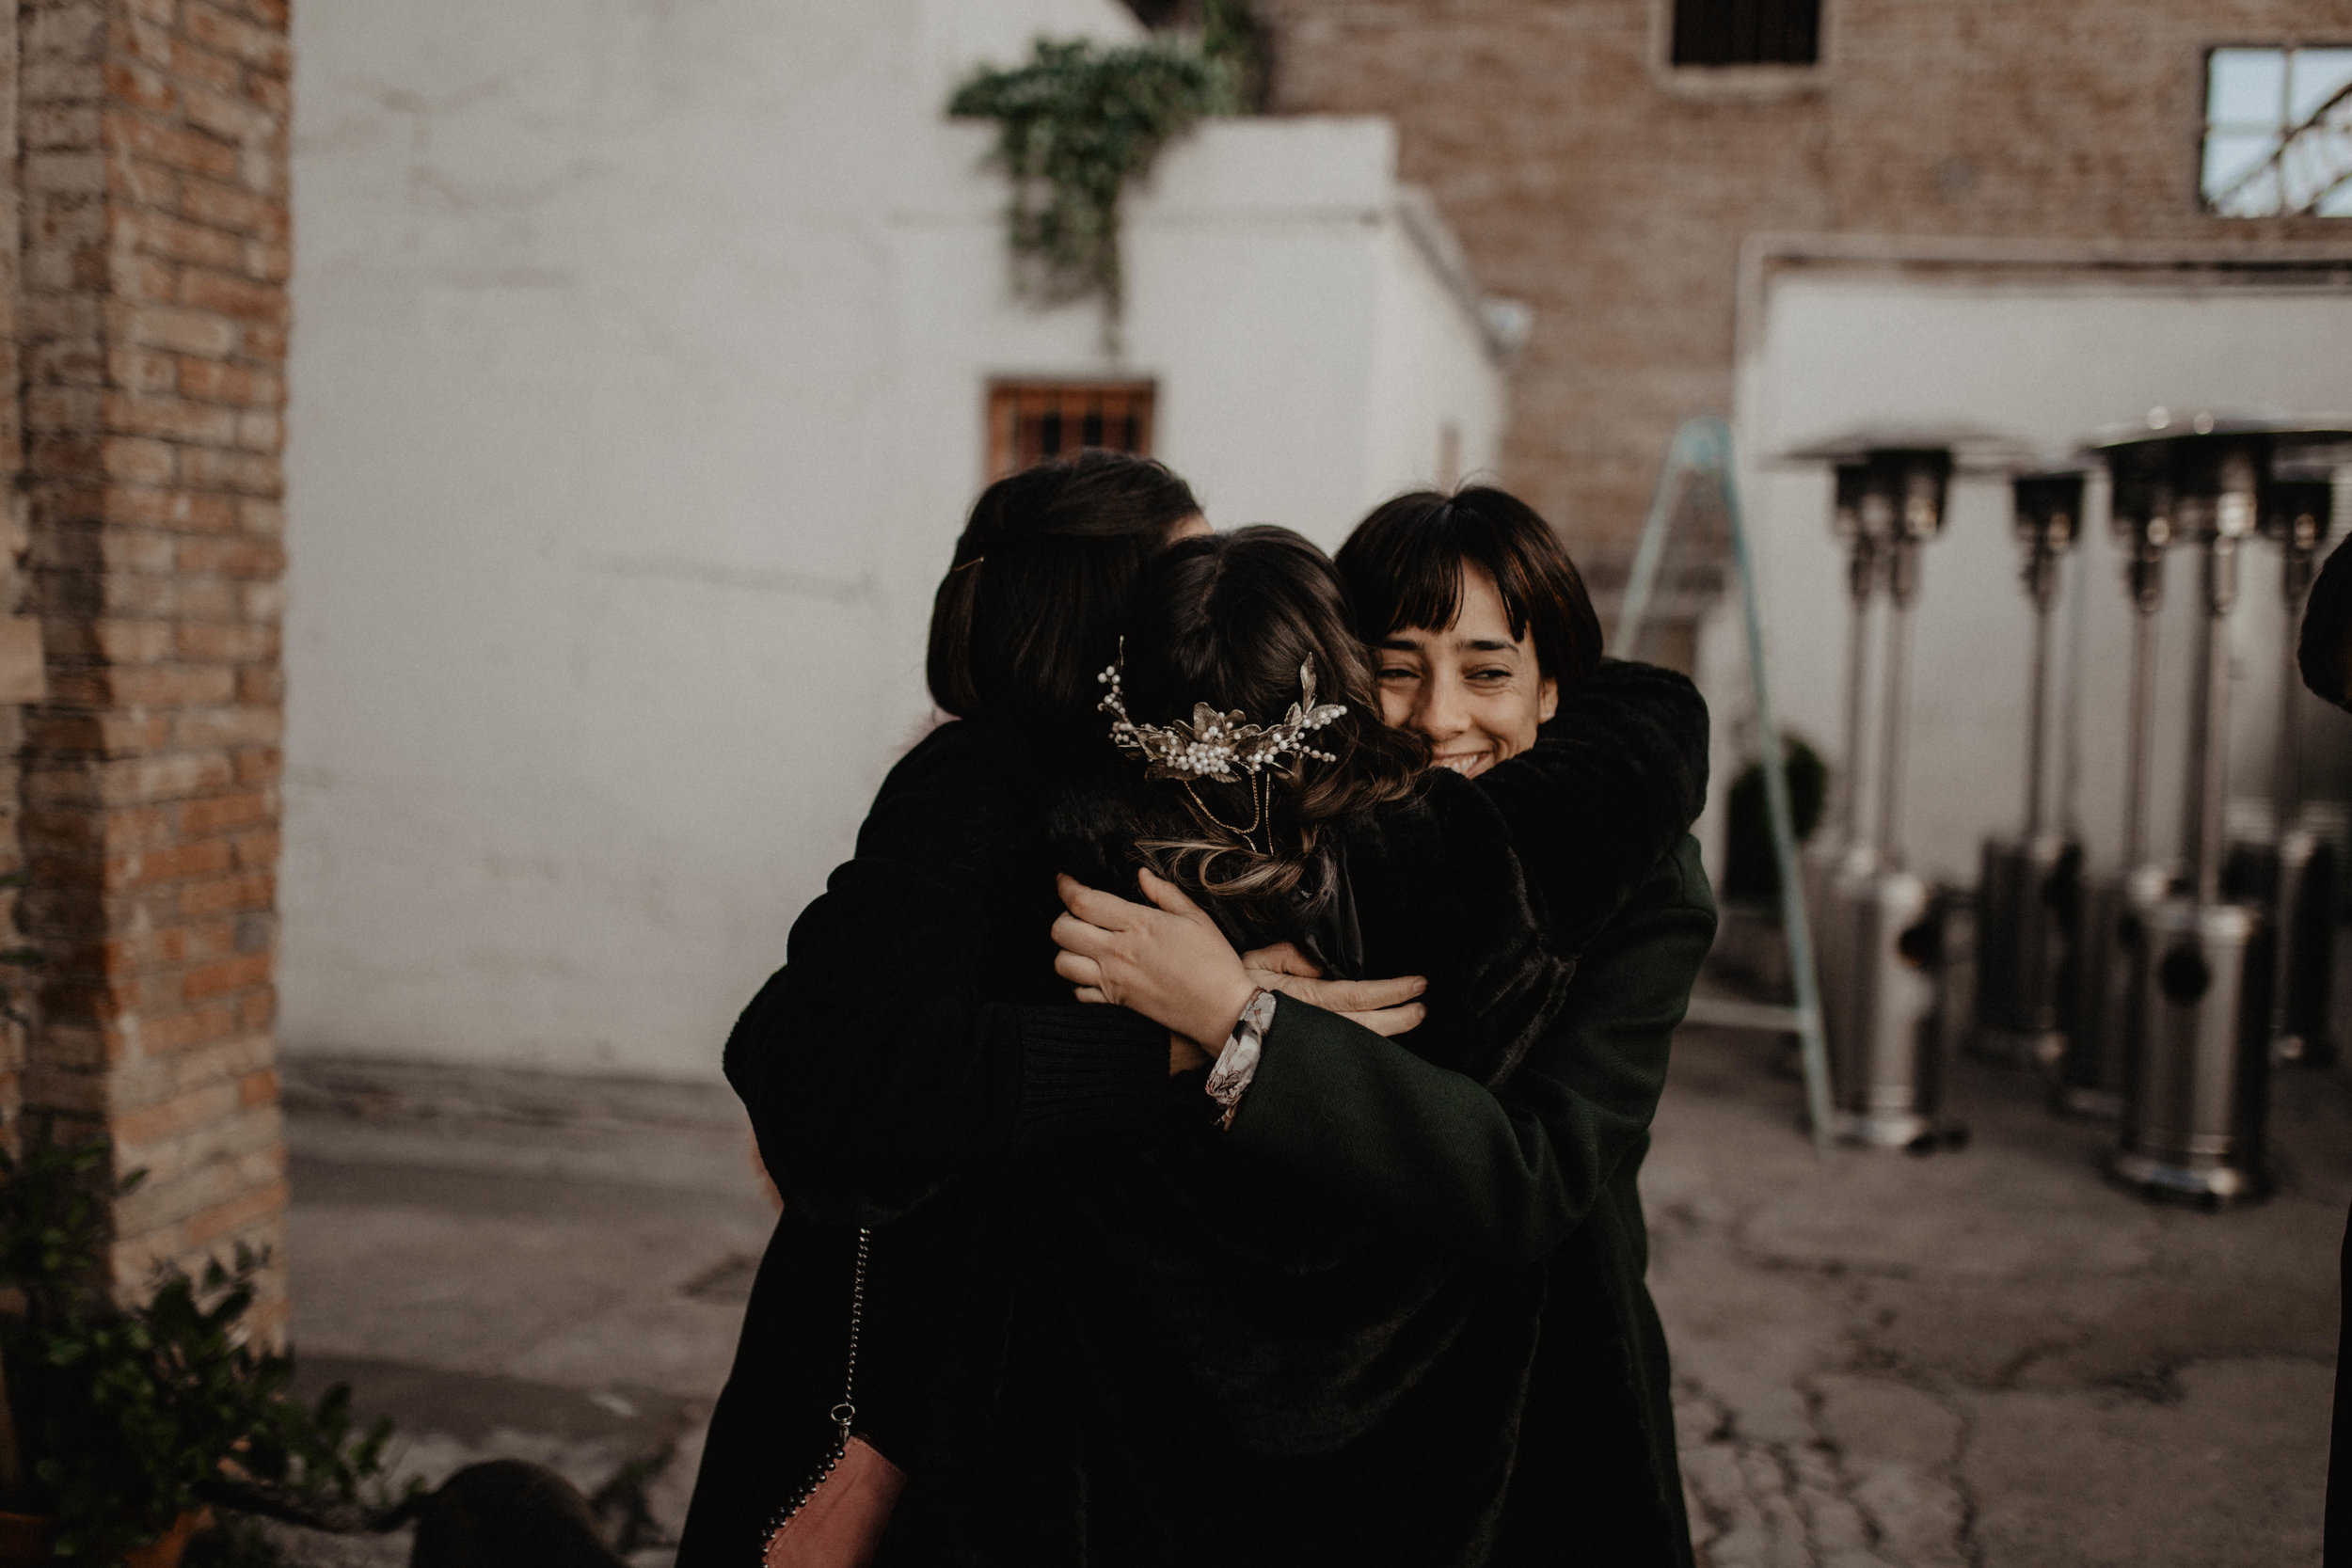 thenortherngirlphotography-photography-weddingphotography-couple-bodasconestilo-bodasenbarcelona-martadavid-108.jpg